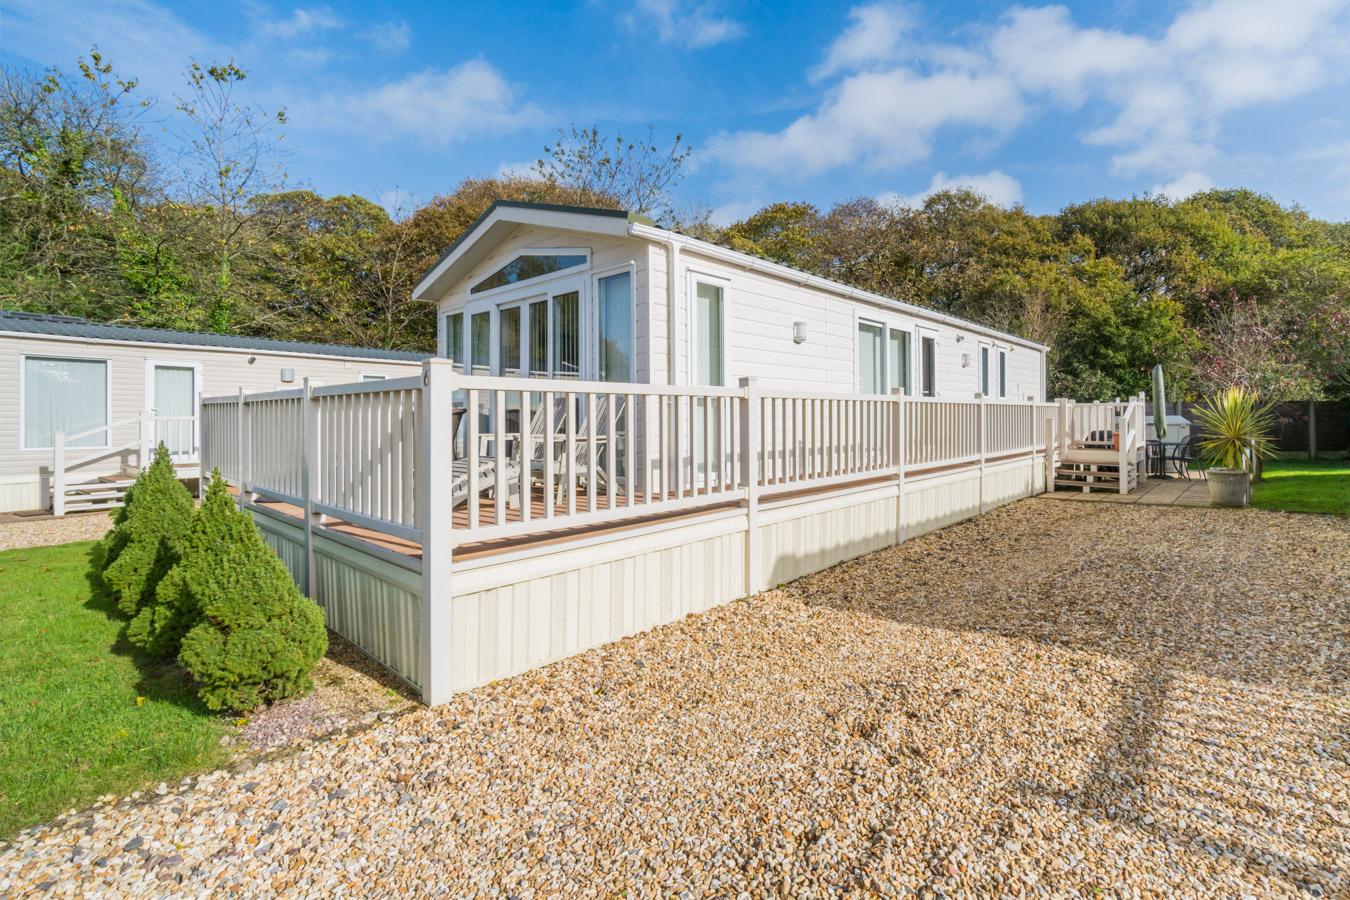 Neil-Bigwood-Monkton-Wyld-Holiday-Homes-42